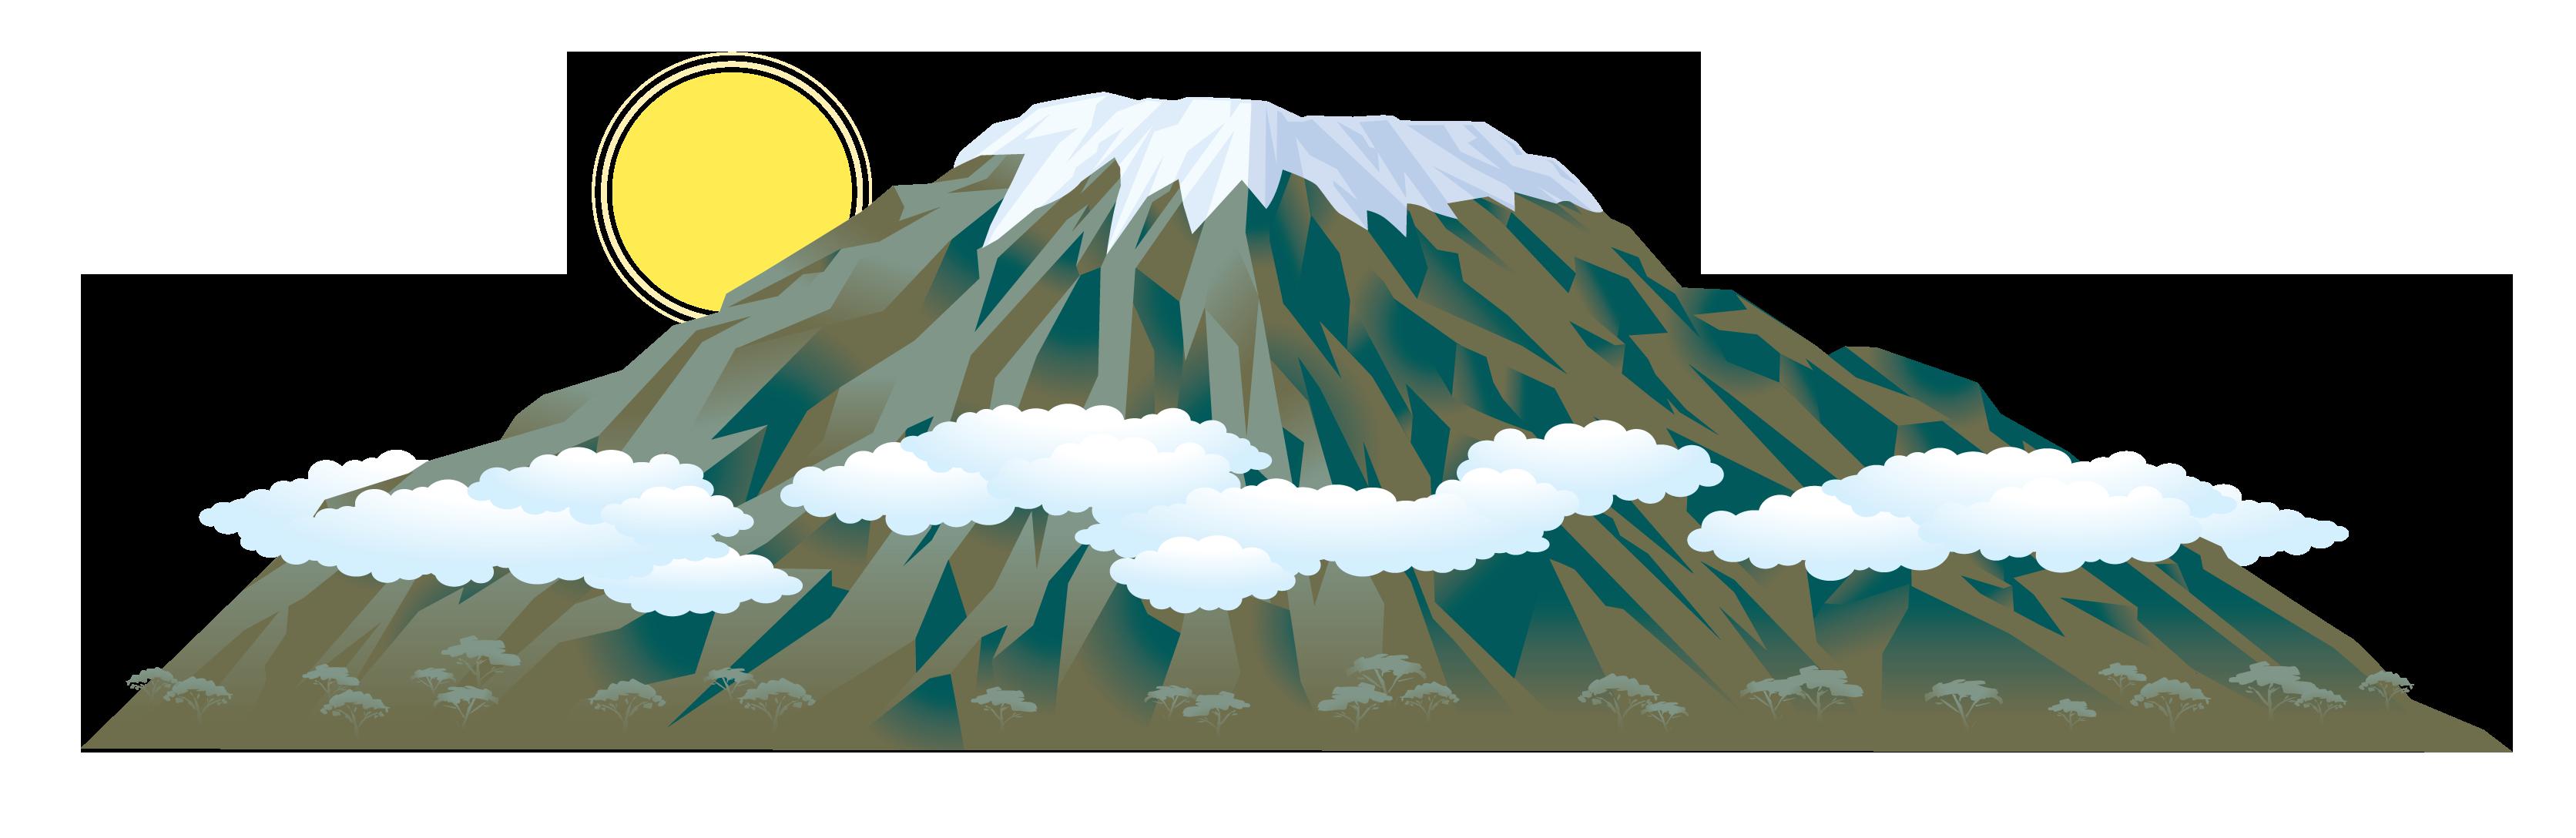 Mount Kilimanjaro Clipart.